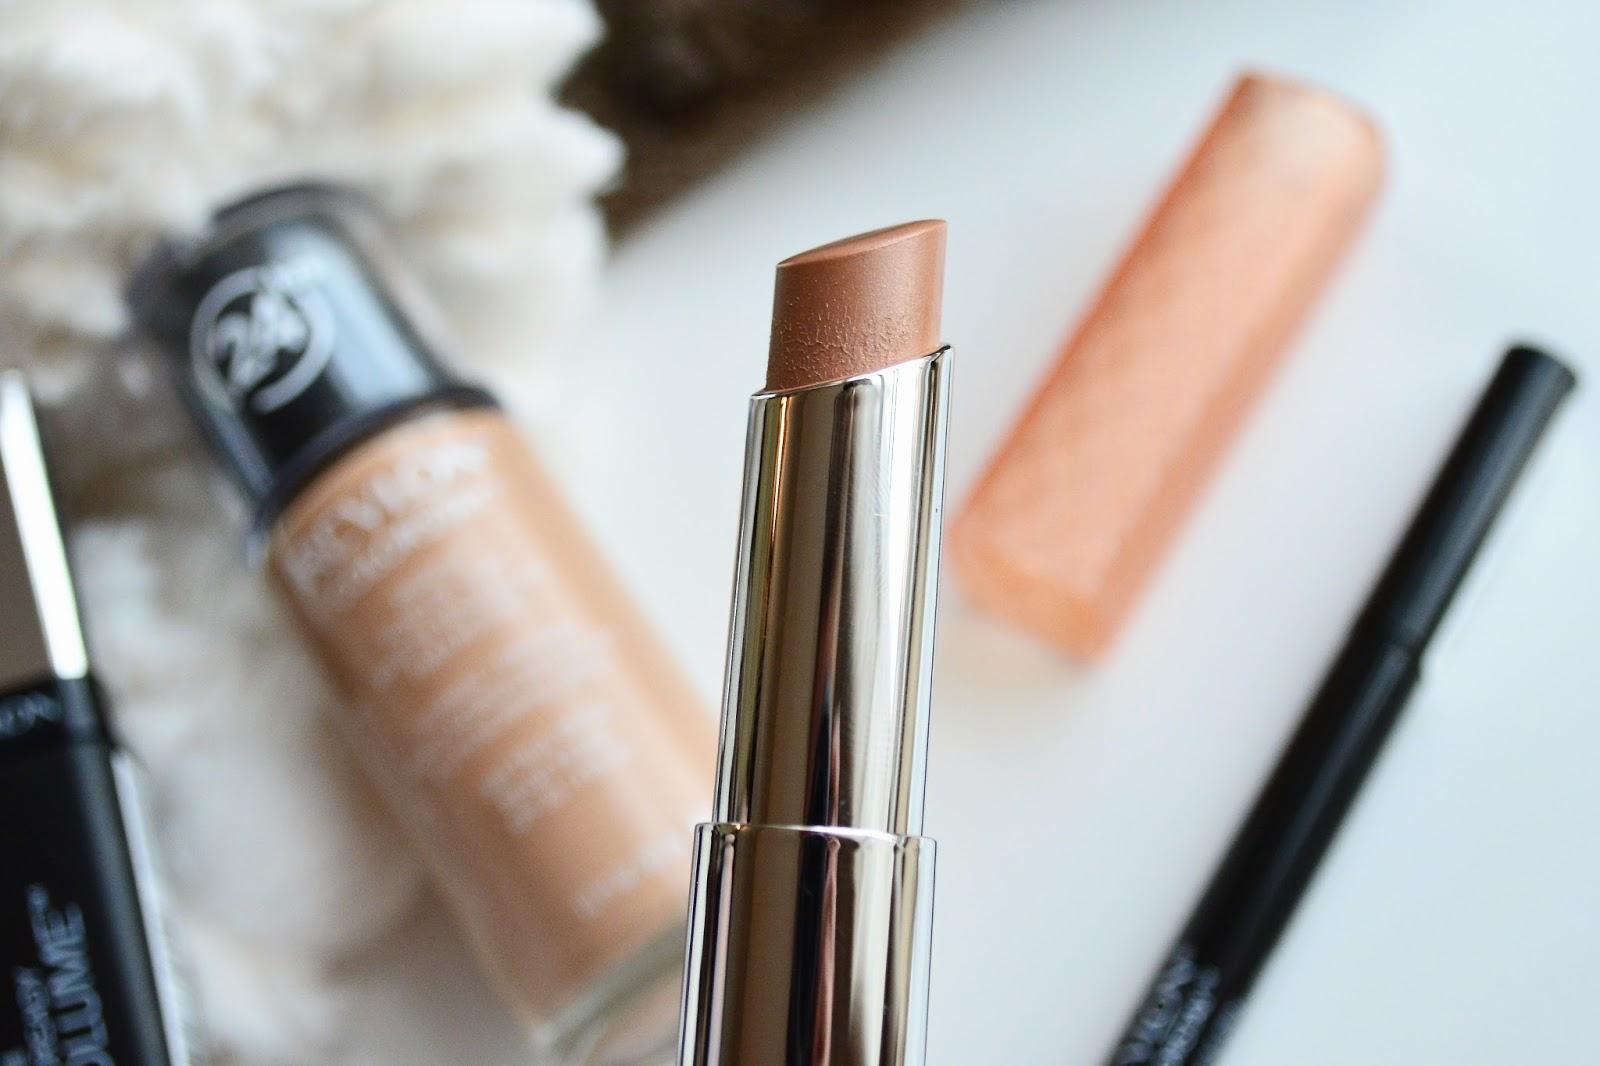 Revlon, Revlon Makeup, Revlon Color Stay, Foundation, Revlon Lip Butter, Brand Focus,